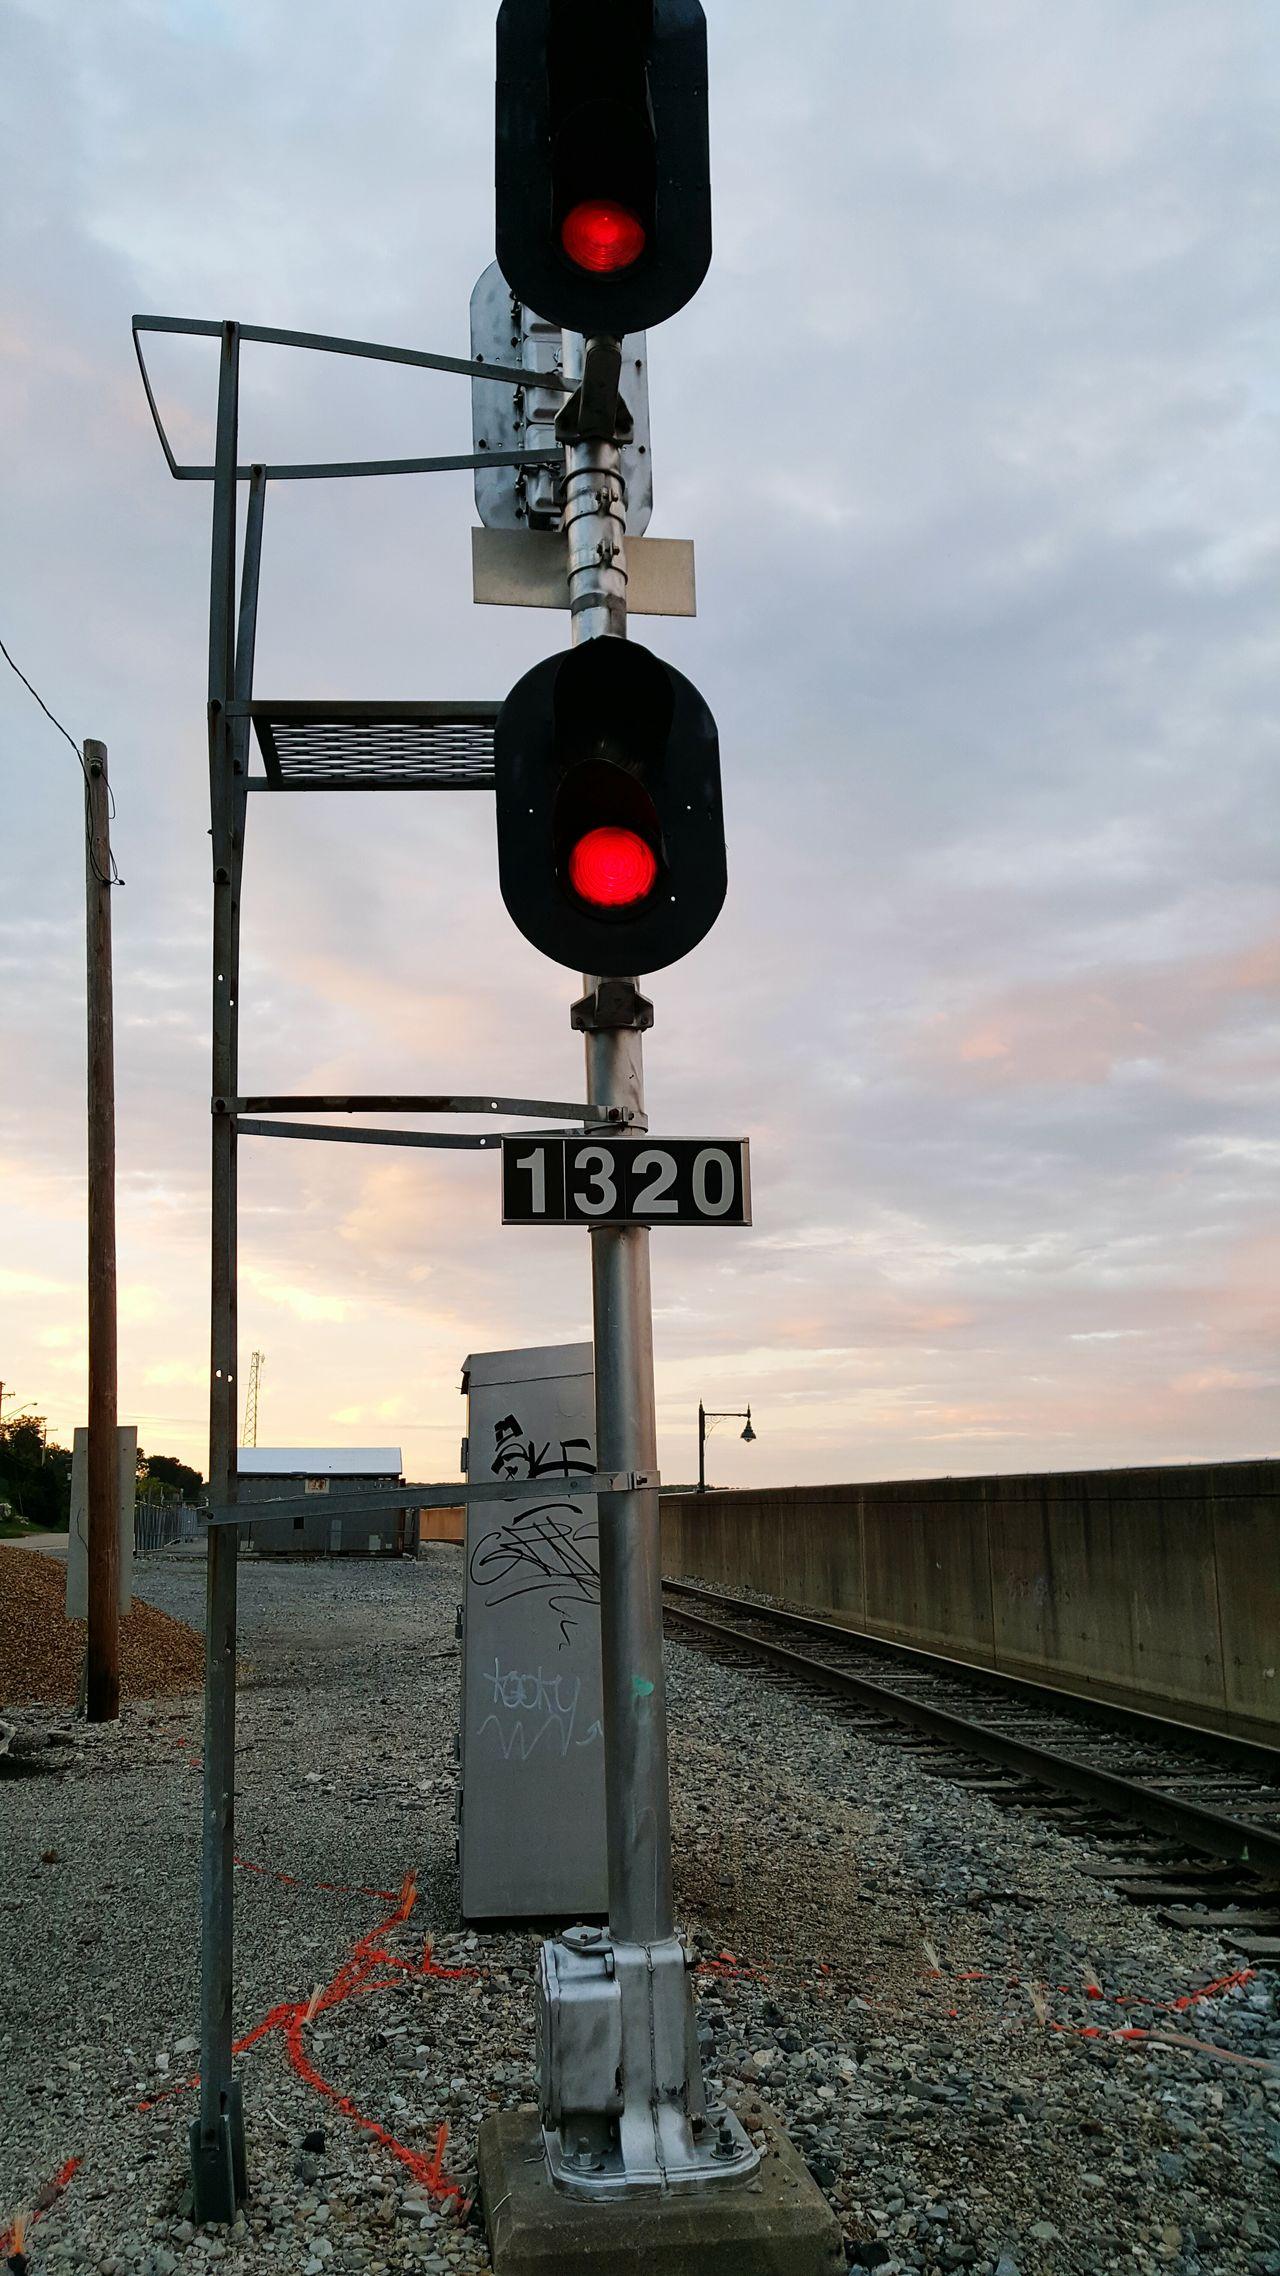 Train Trainphotography Train Tracks Train Lights Showcase June